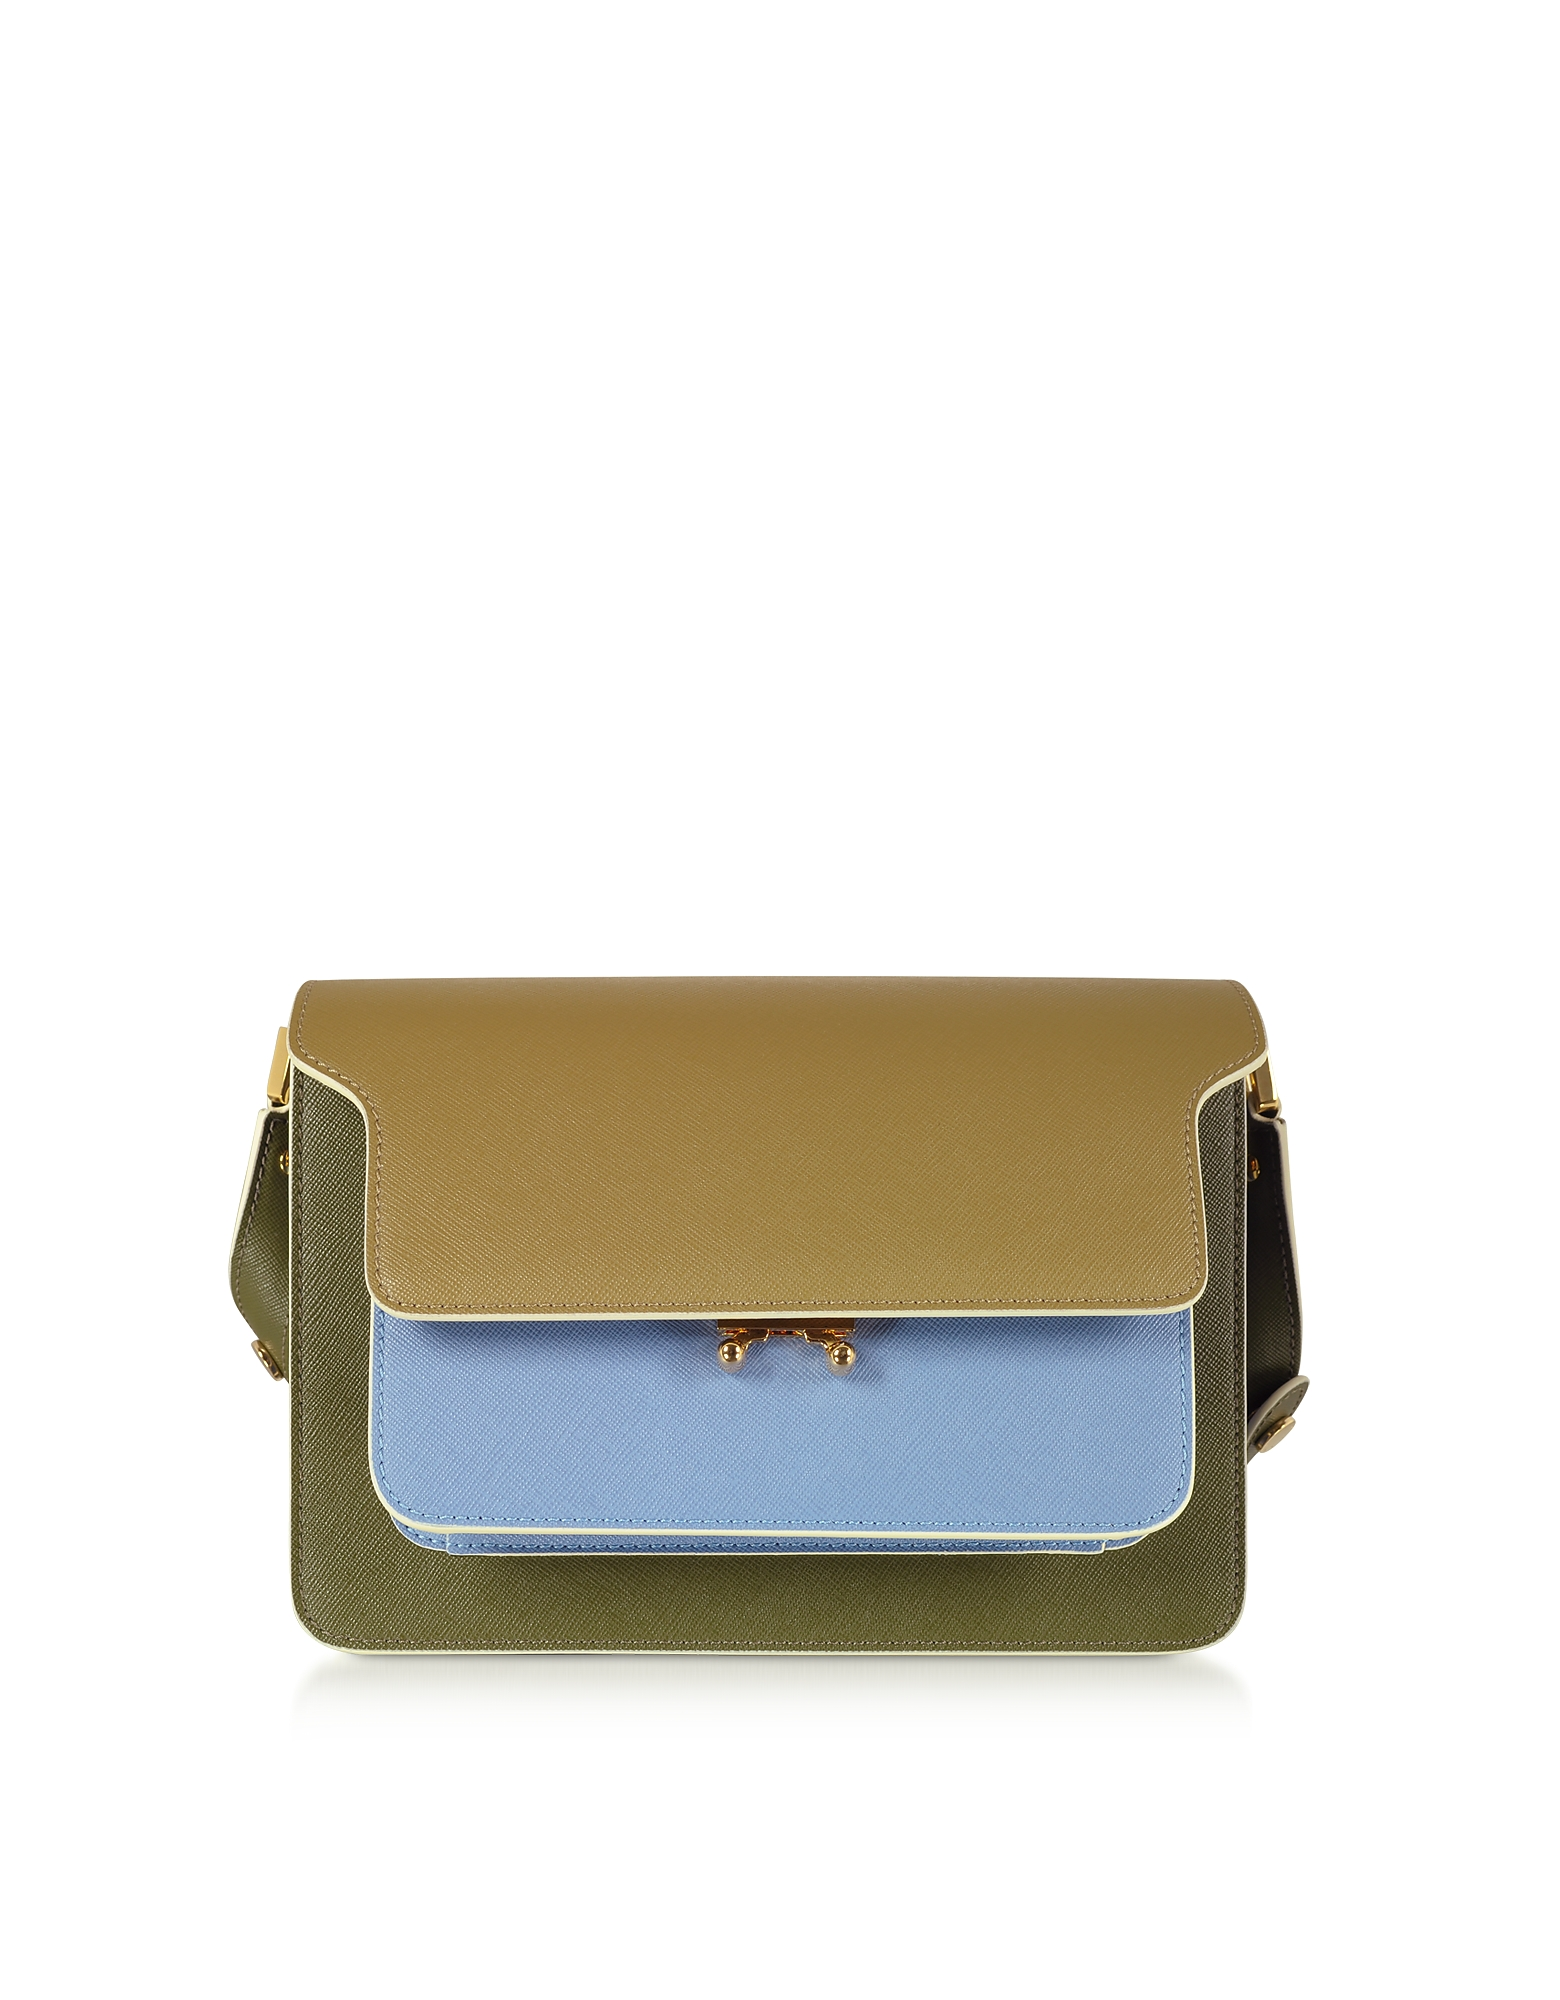 Marni Designer Handbags, Color Block Saffiano Leather Mini Trunk Bag